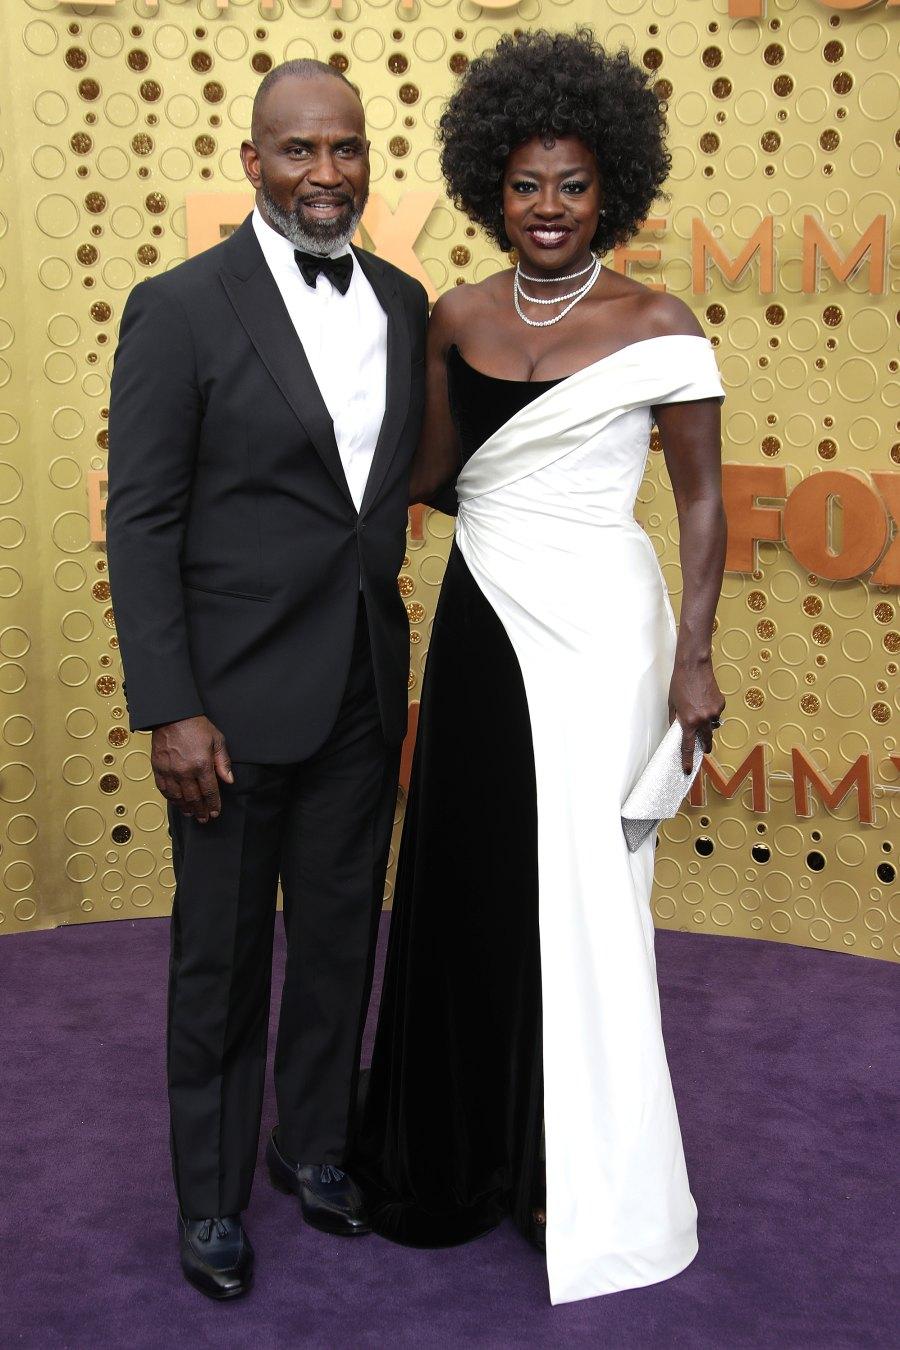 Emmys 2019 Stylish Couples - Viola Davis and Julius Tennon